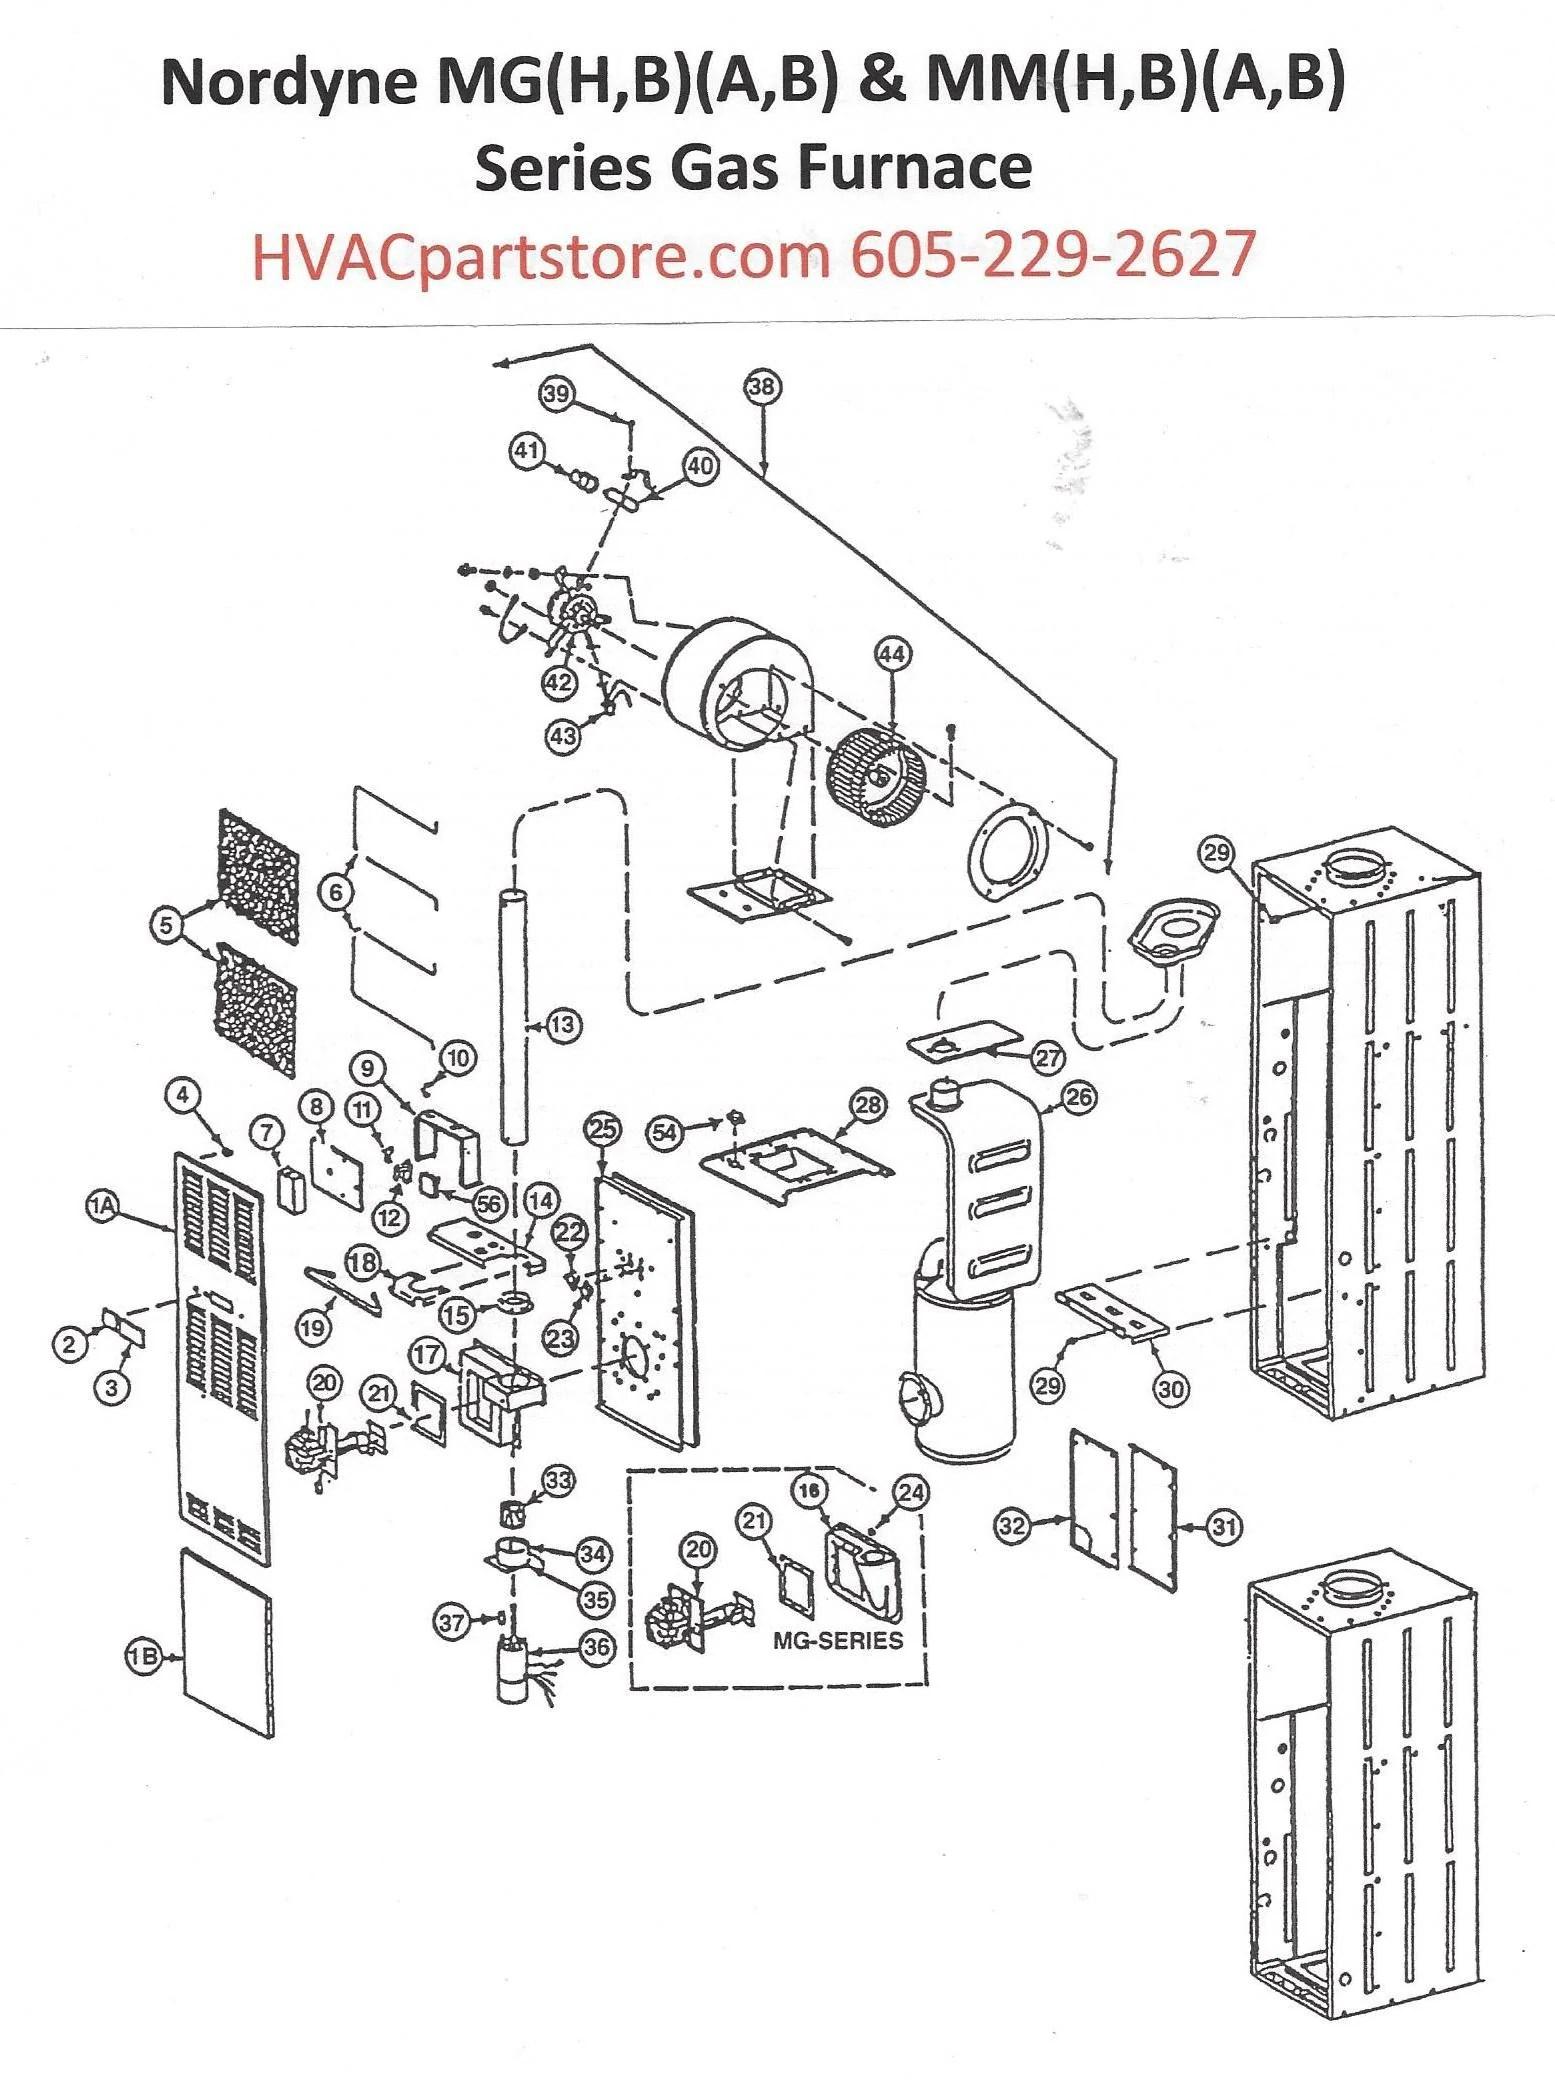 nordyne gas furnace wire diagram